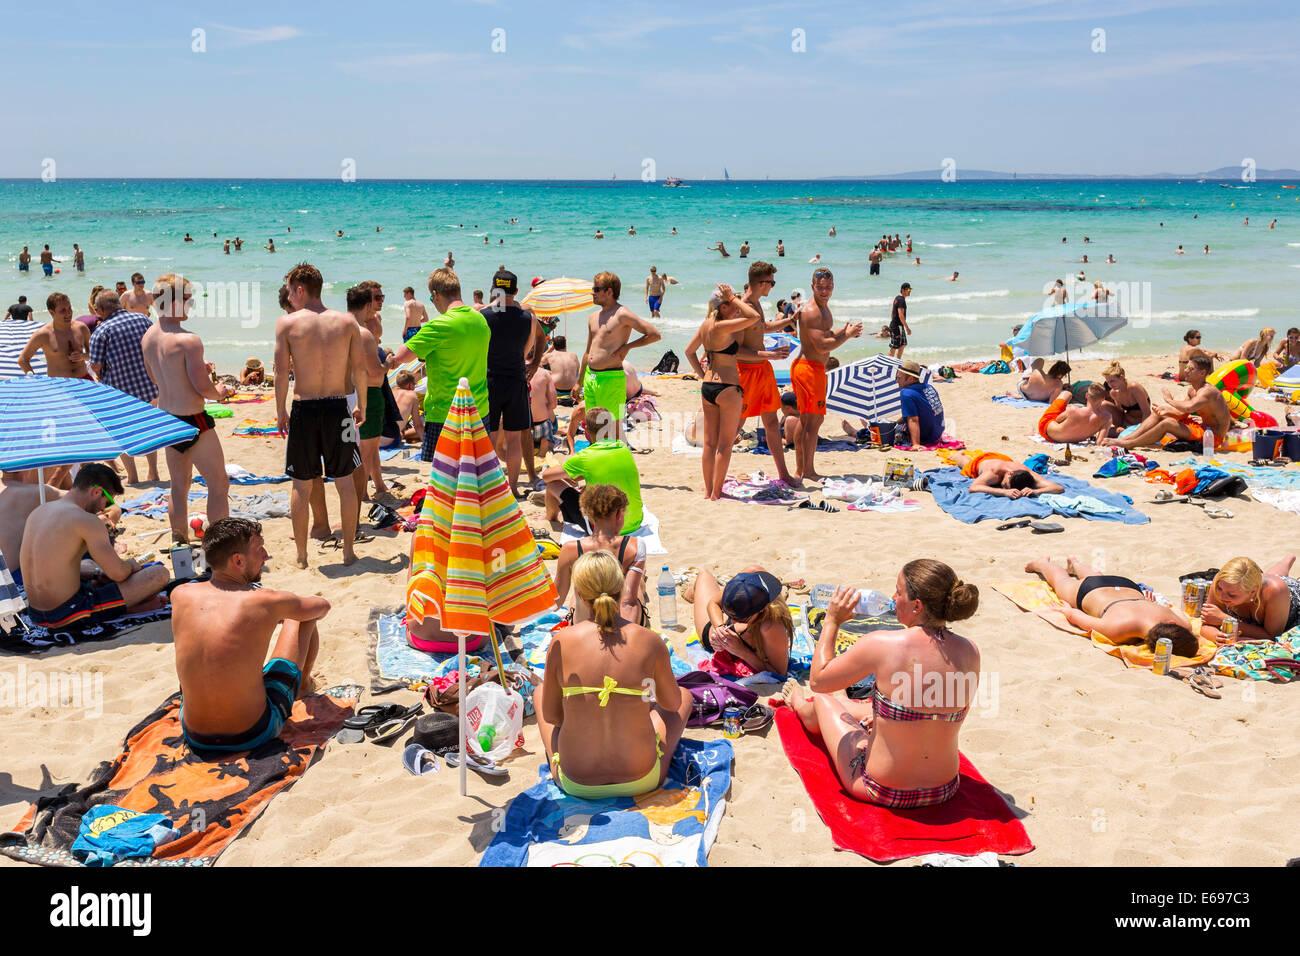 majorca beach party stockfotos und